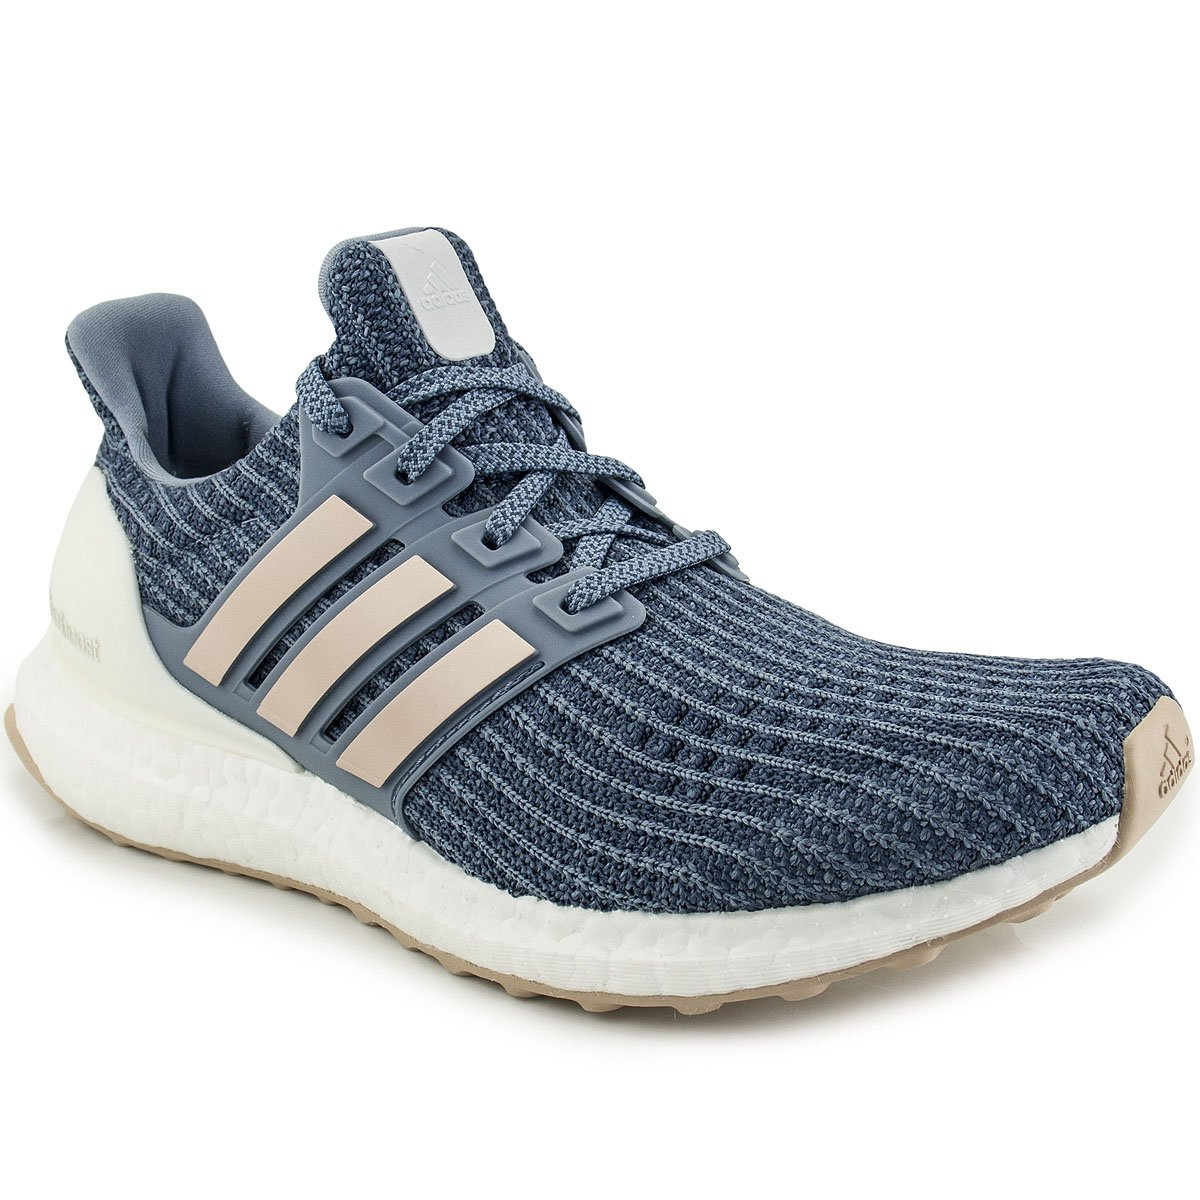 Tênis Adidas Ultra Boost Feminino  56112638d302e